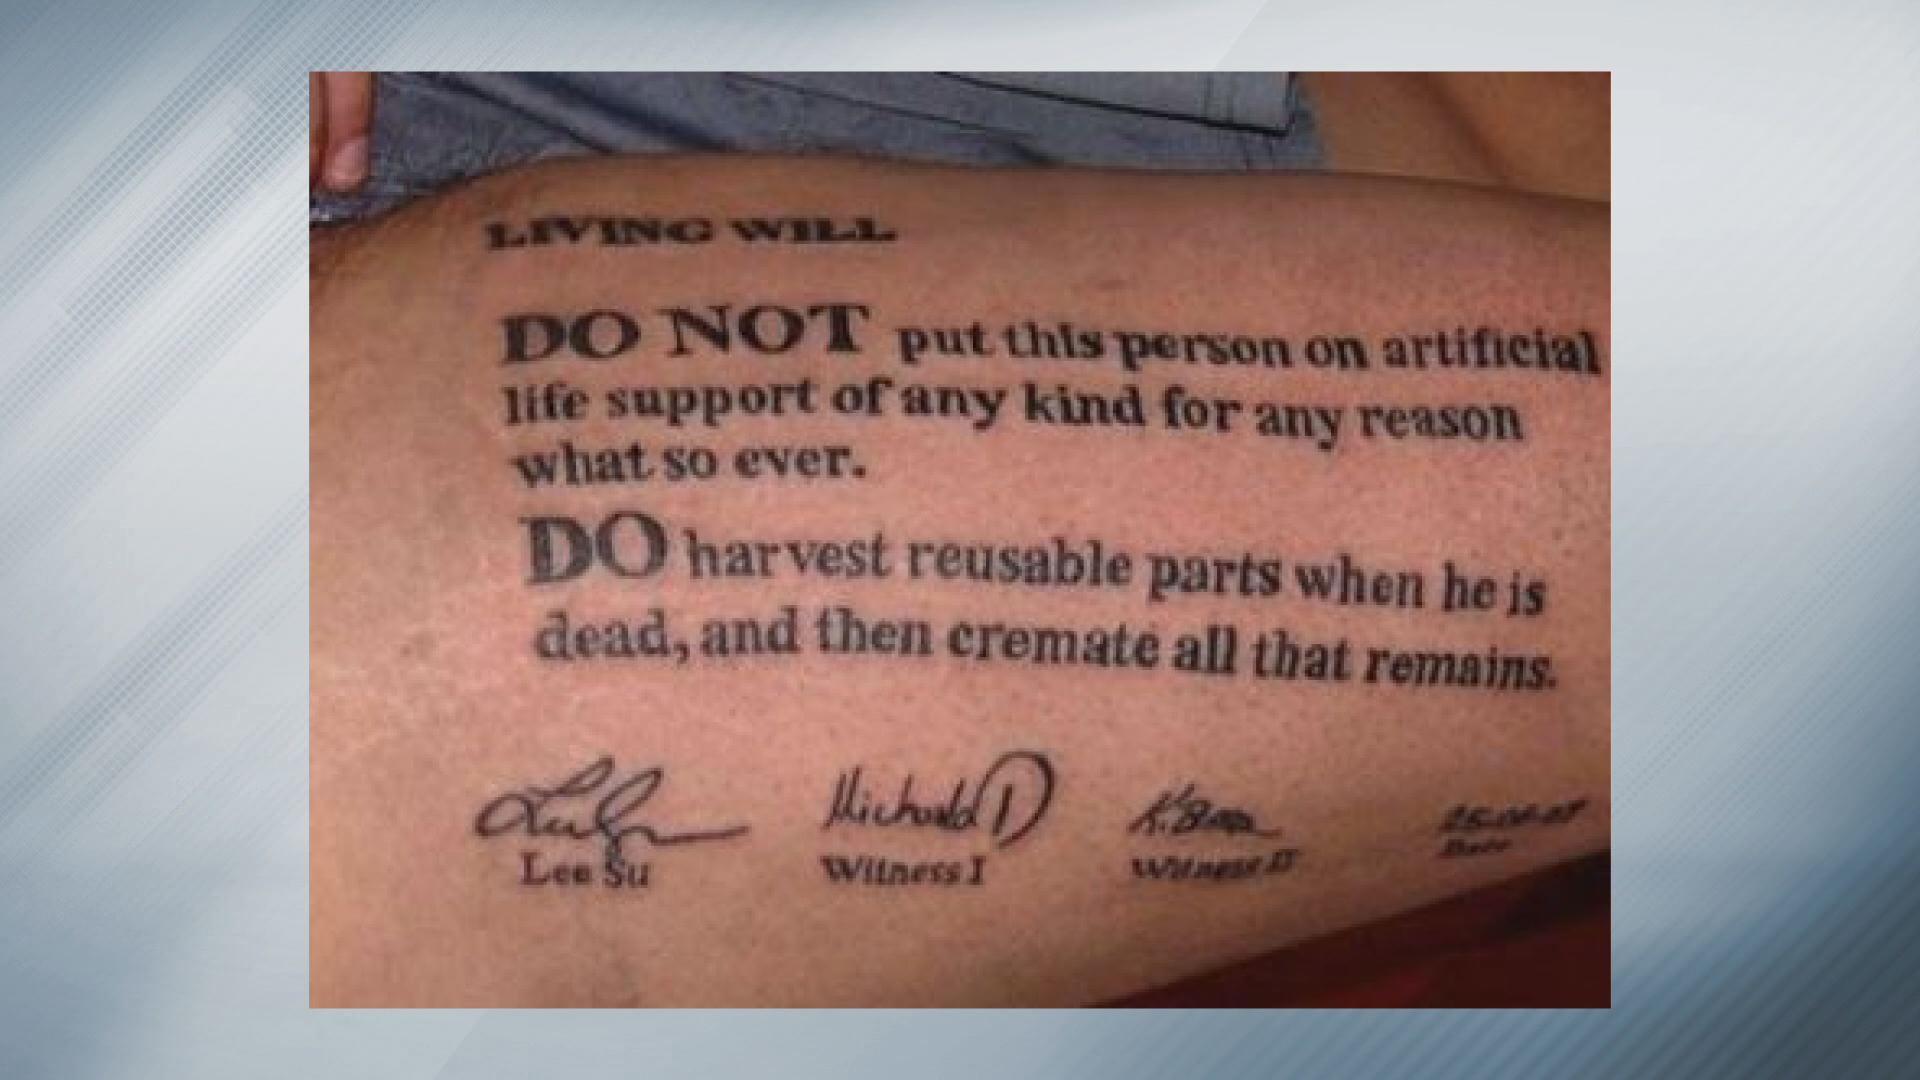 Do not resuscitate tattoo won't work in Colorado | 9news.com